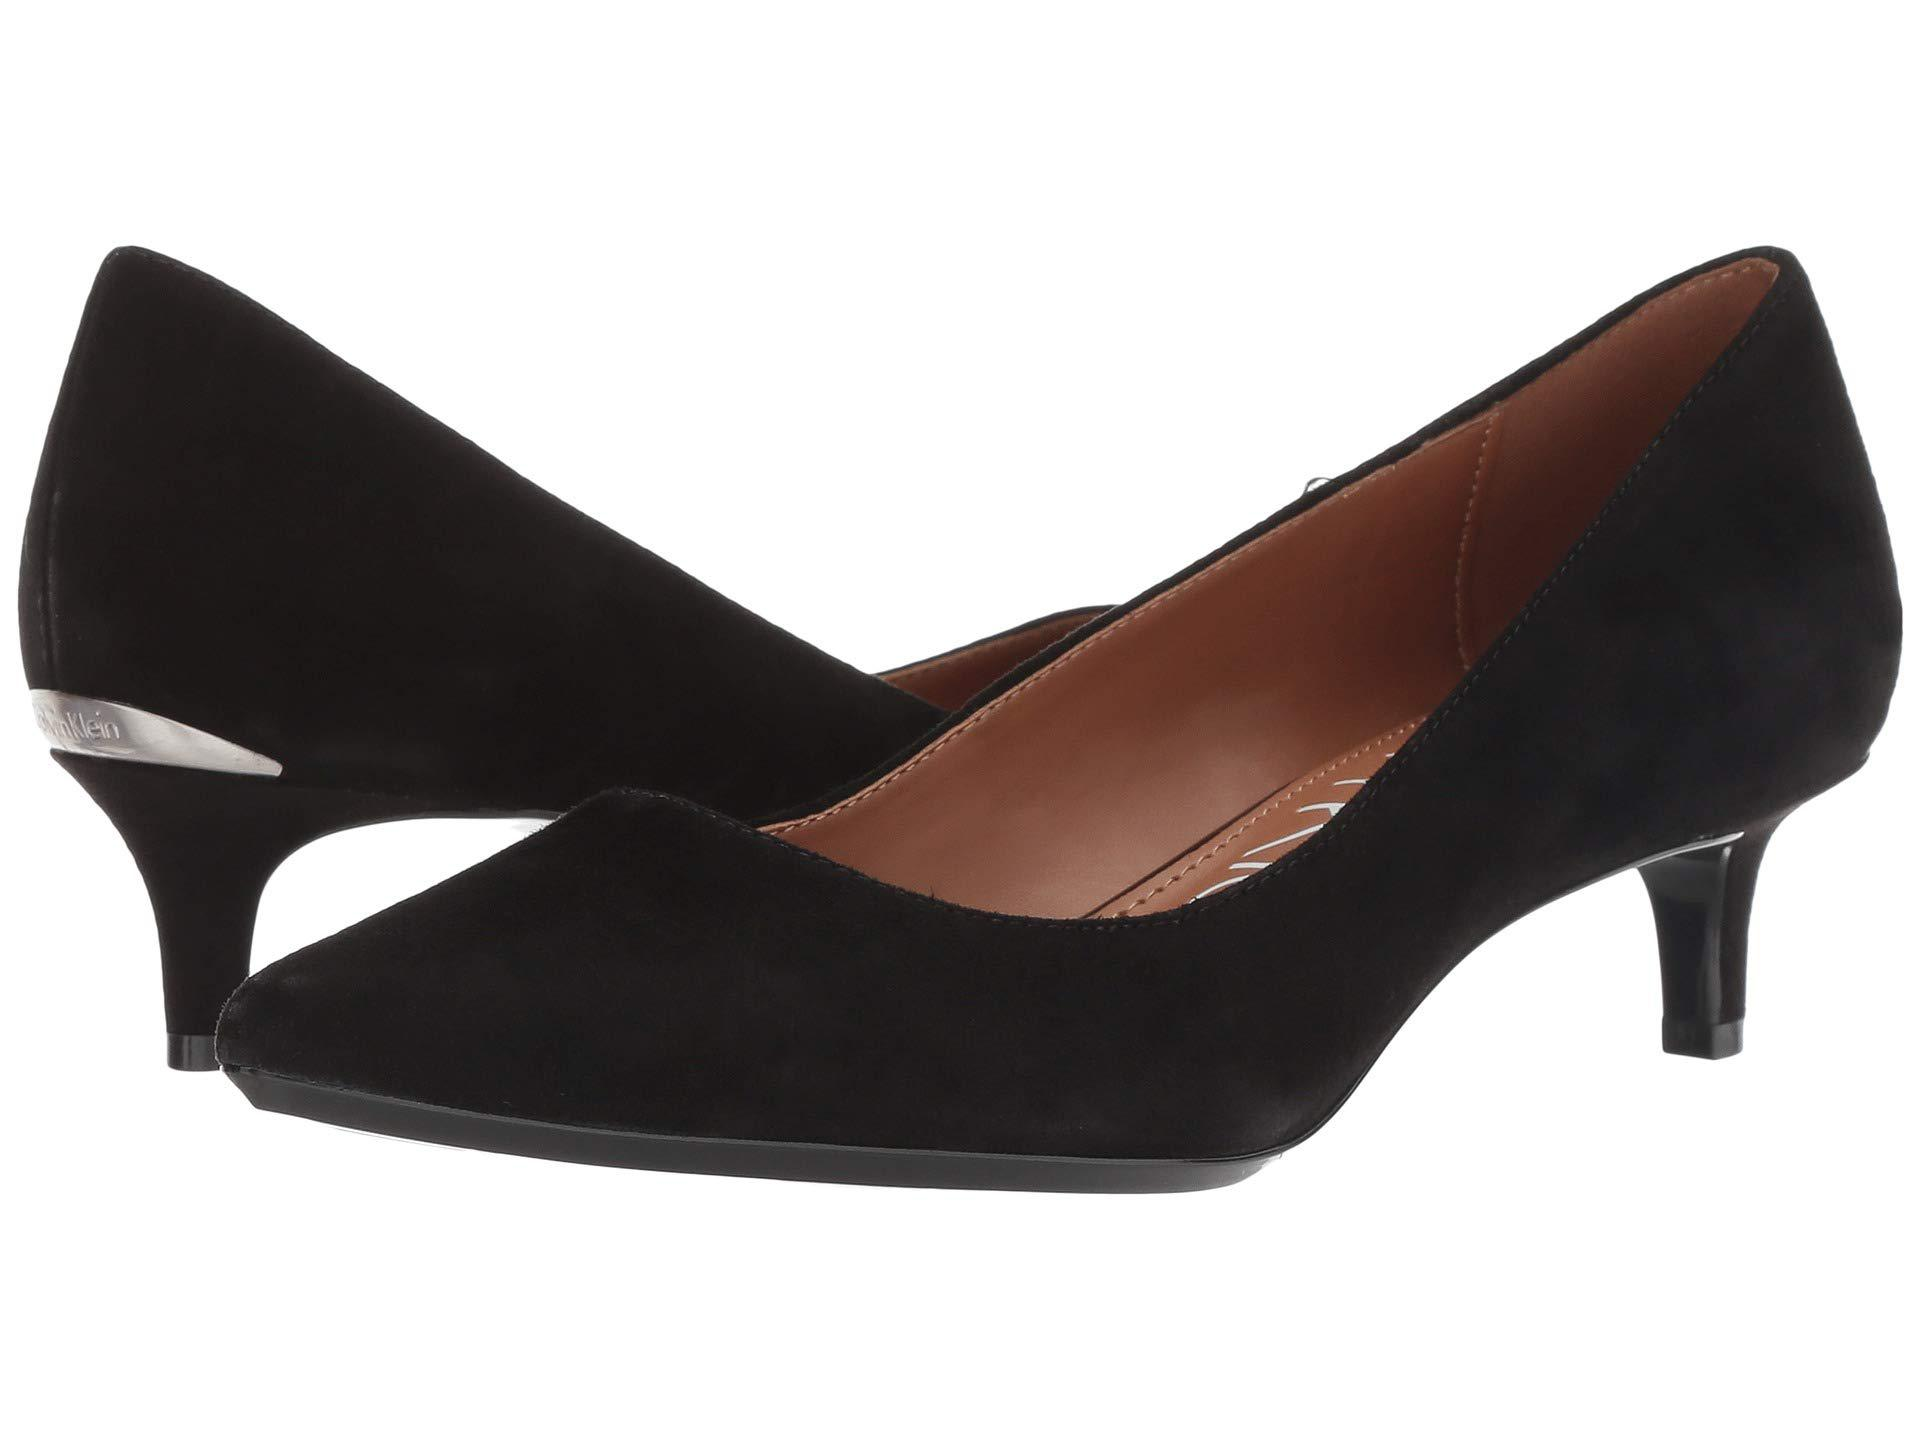 e142515a2329 Lyst - Calvin Klein Gabrianna Pump (black Suede leather) Women s 1-2 ...